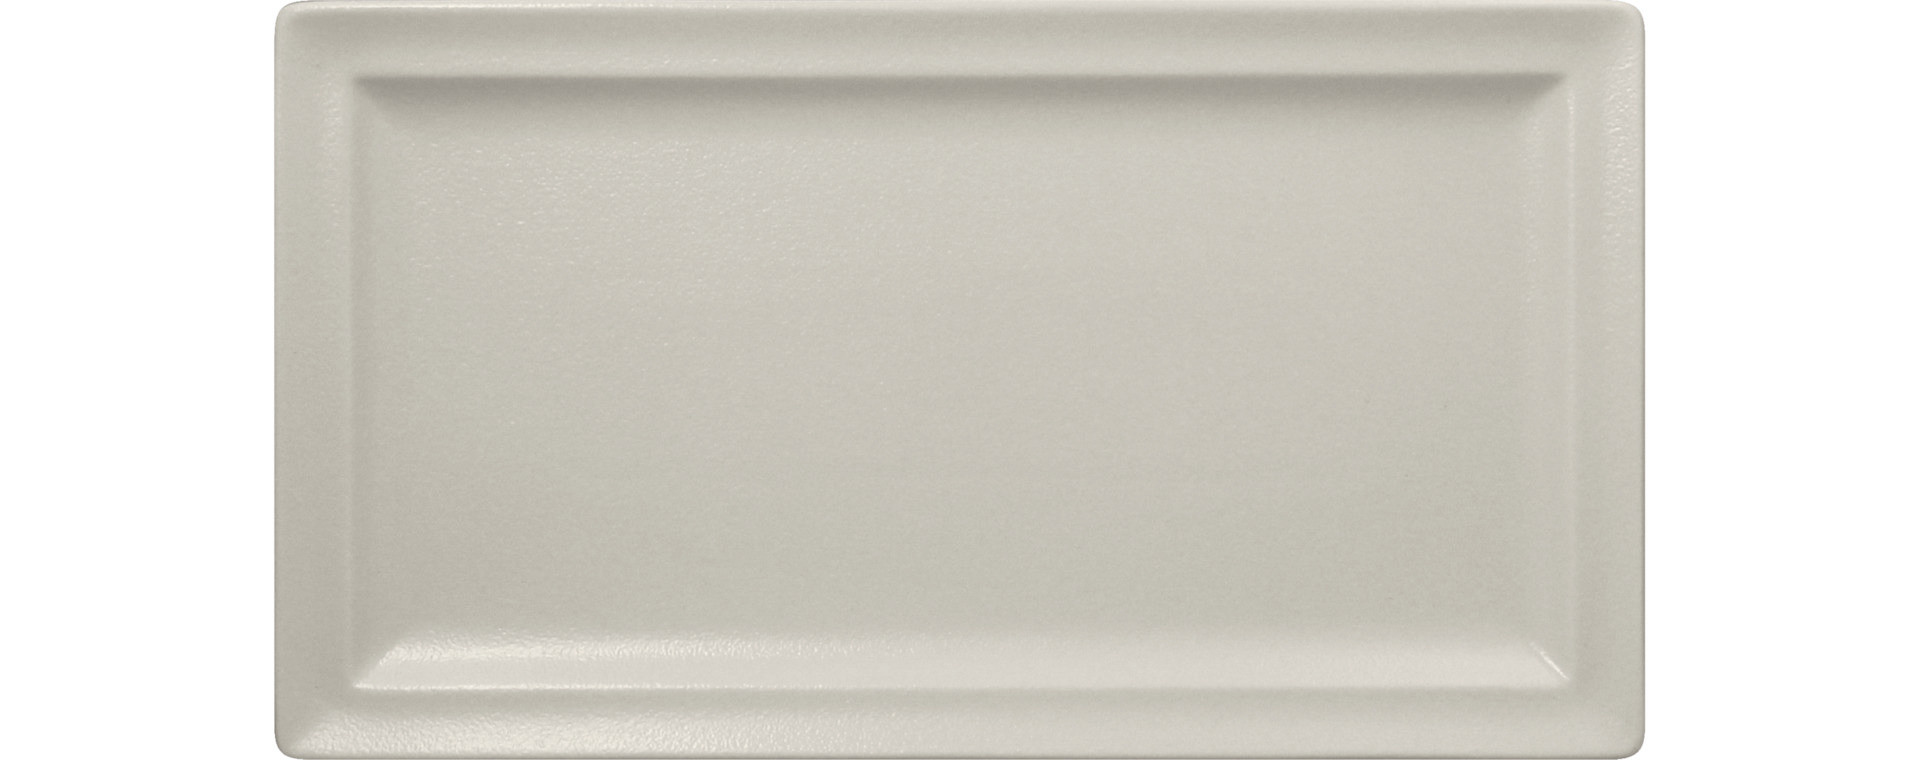 rak neo fusion teller flach rechteckig 380x210 mm wei hinsche gastrowelt. Black Bedroom Furniture Sets. Home Design Ideas